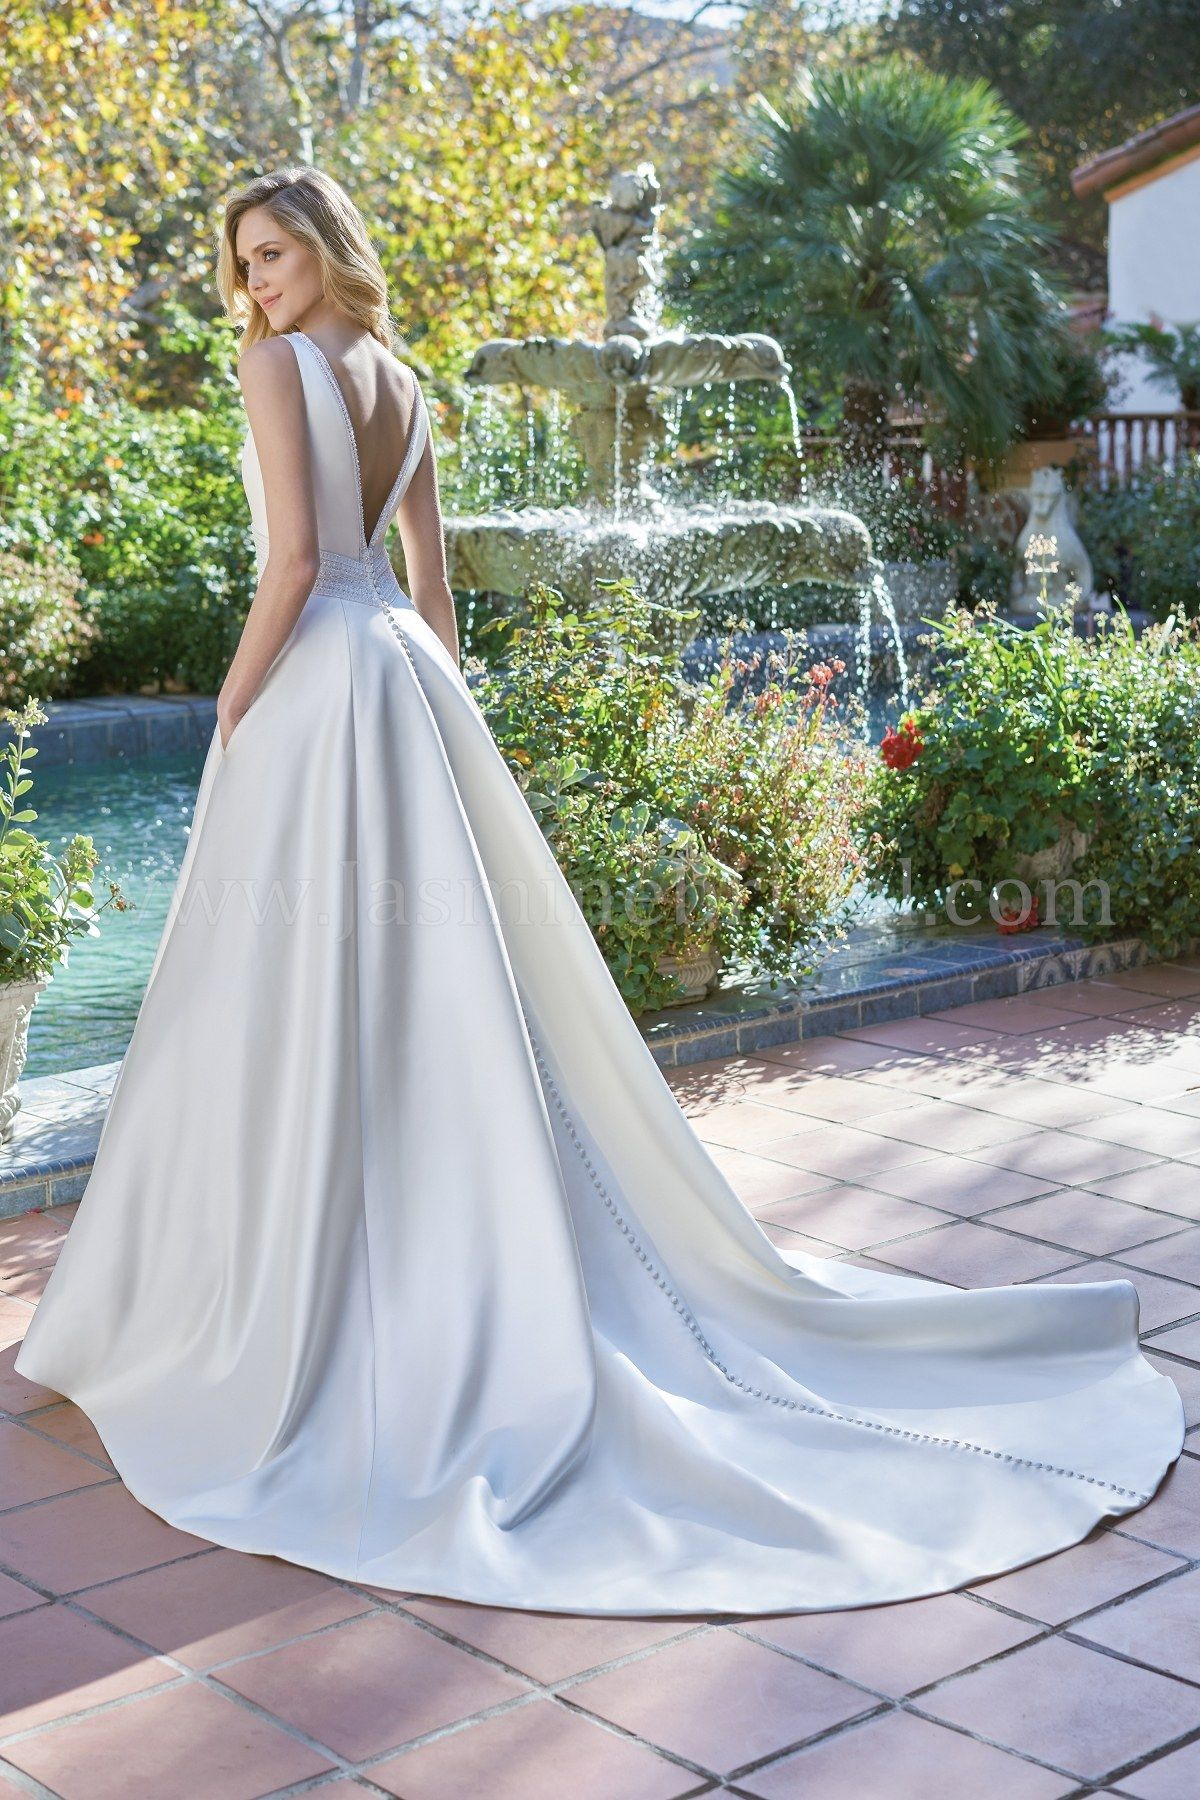 Jasmine Bridal Wedding Dress Beautiful Wedding Dress F201054 V Neck Italian Satin Lace Trim Weddin Satin Bridal Gowns Bridal Ball Gown Wedding Dress Trim